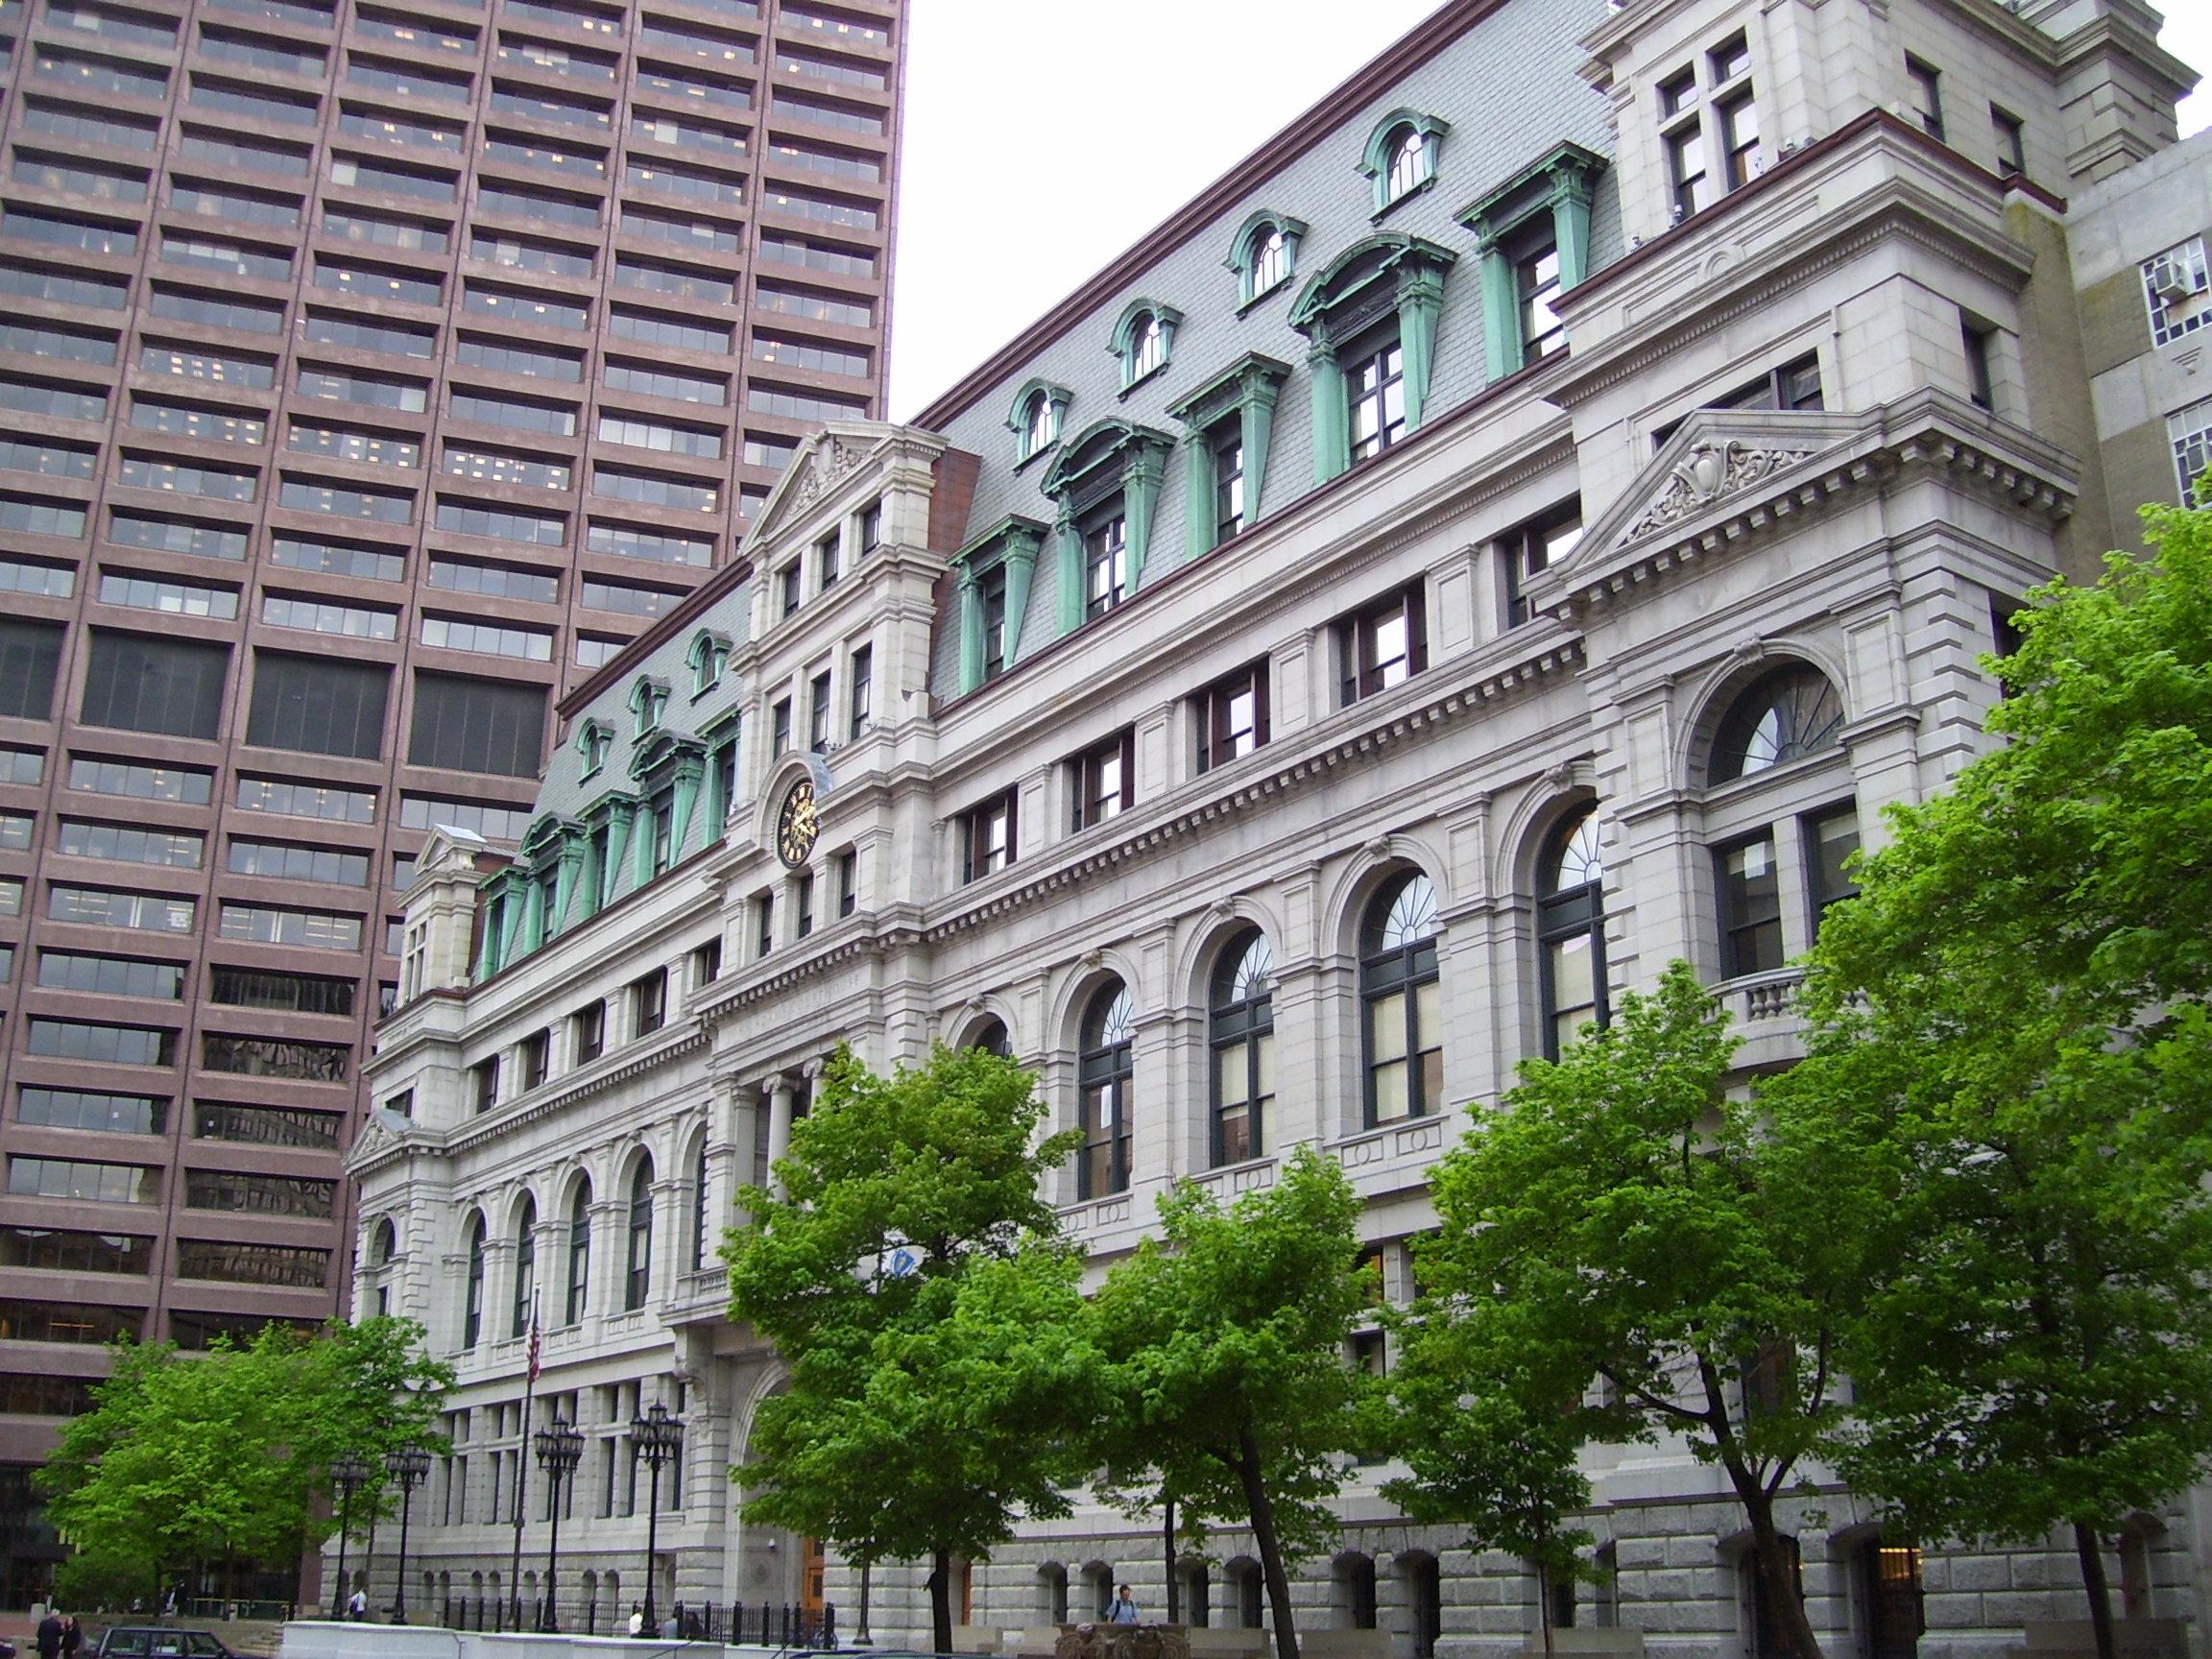 John Adams Courthouse SJC